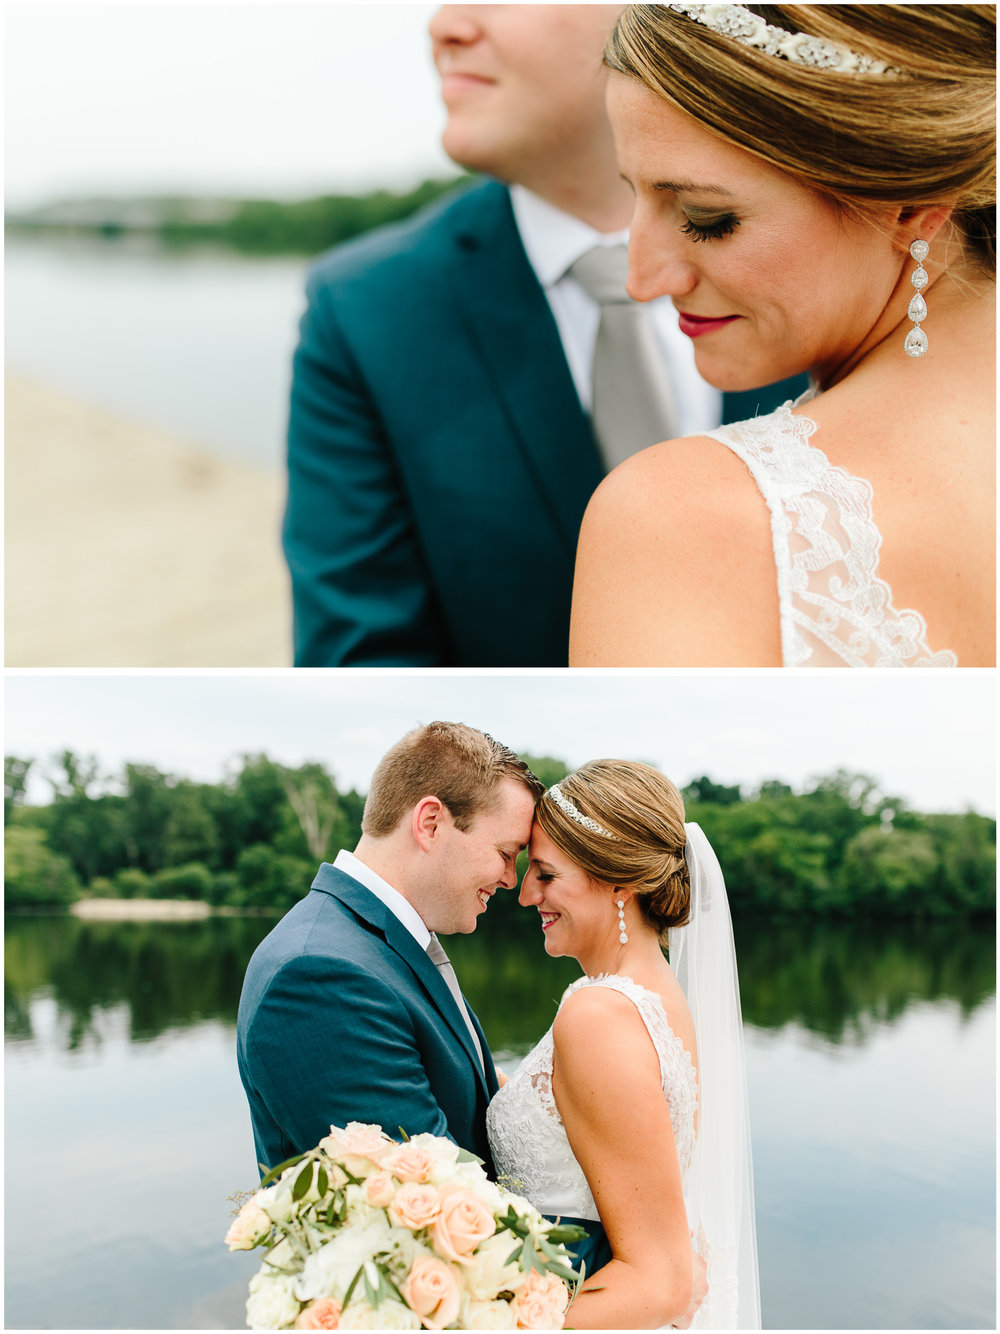 ann_arbor_michigan_wedding_37.jpg